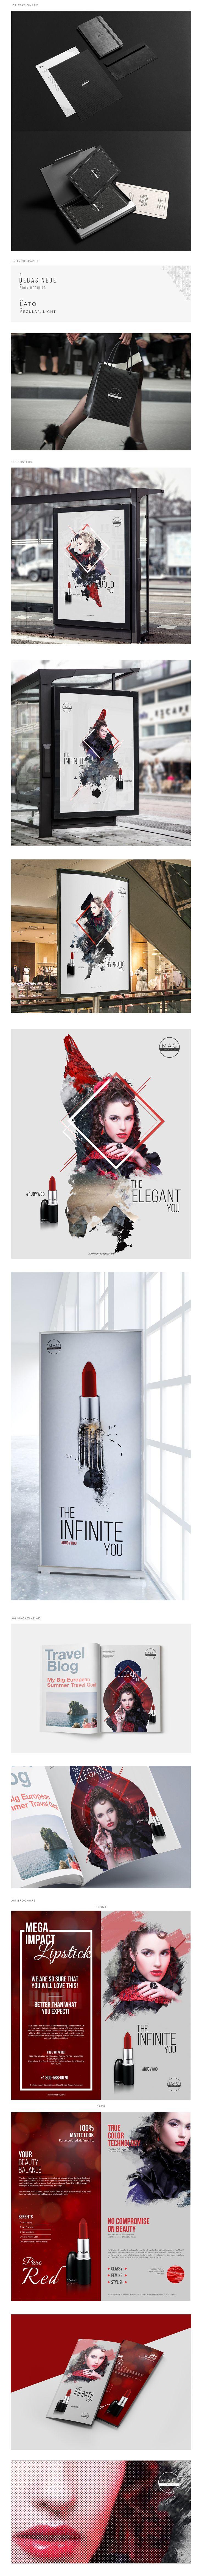 Poster design on mac -  Logo Rebranding Campaign Advertising Project Cosmetics Lipstick